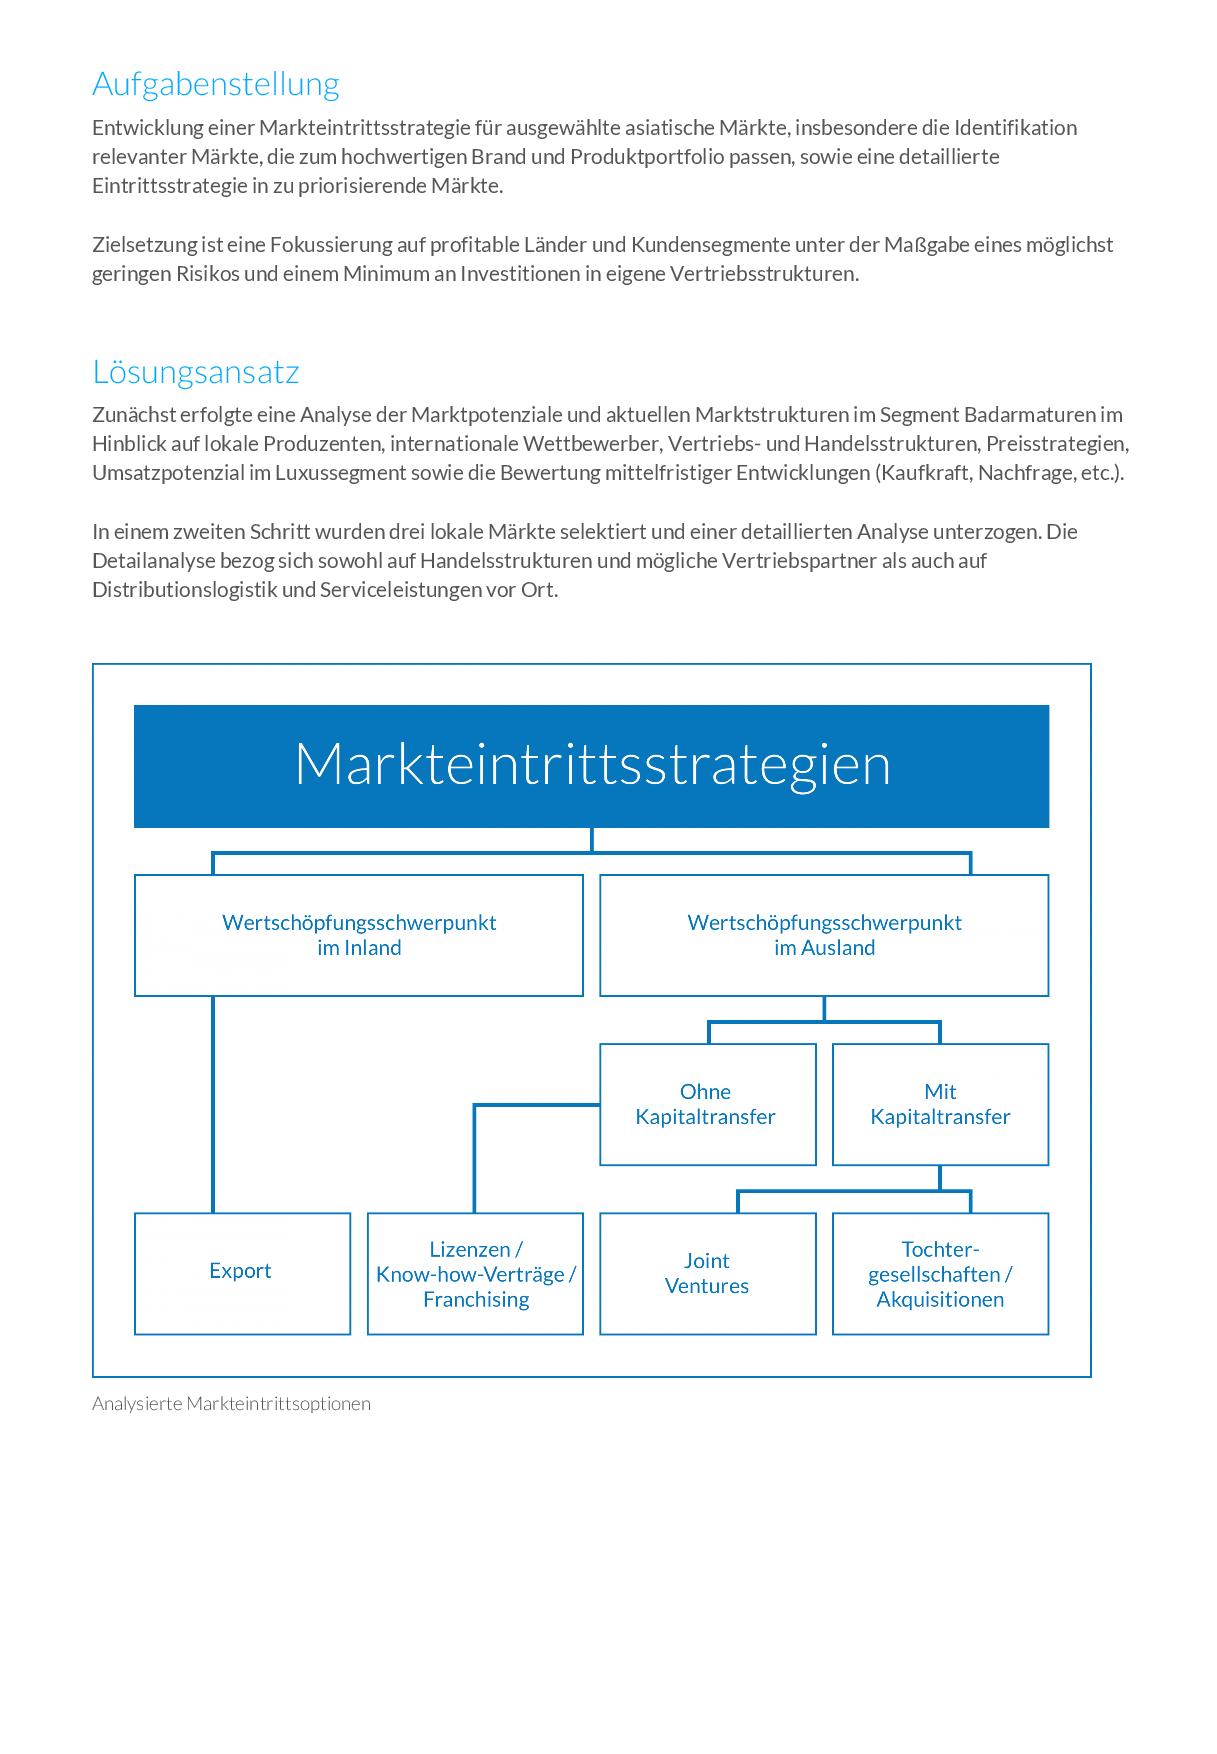 4 Case Study_B2B_Content_Marketing_Referenzmarketing_Trusted_References 2